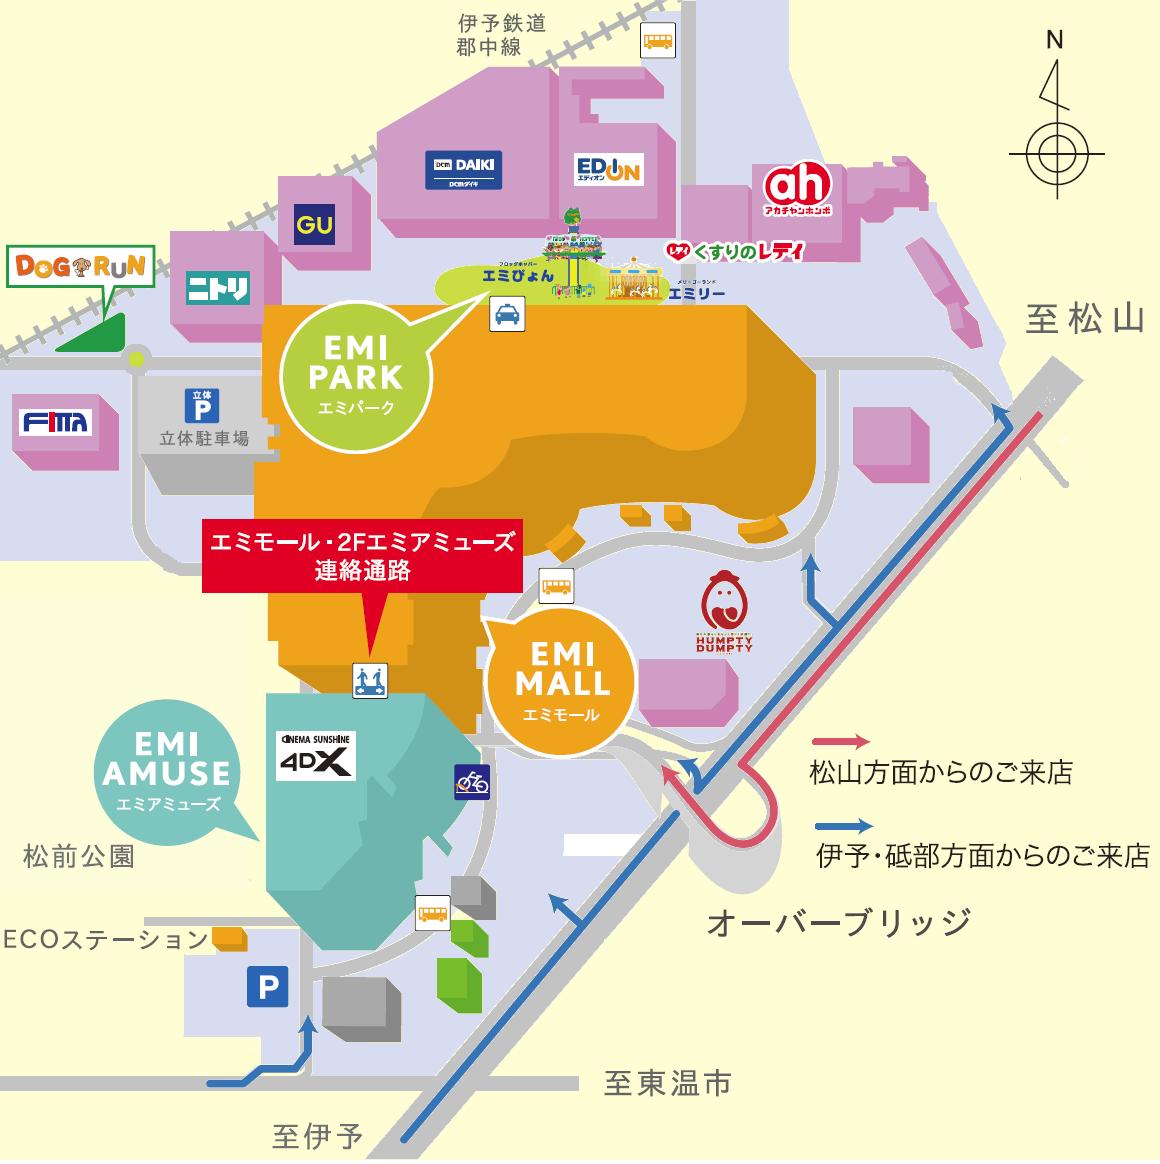 https://emifull.jp/news/9a96805e4d84d130c46f1eb6bb66028fafe94624.png